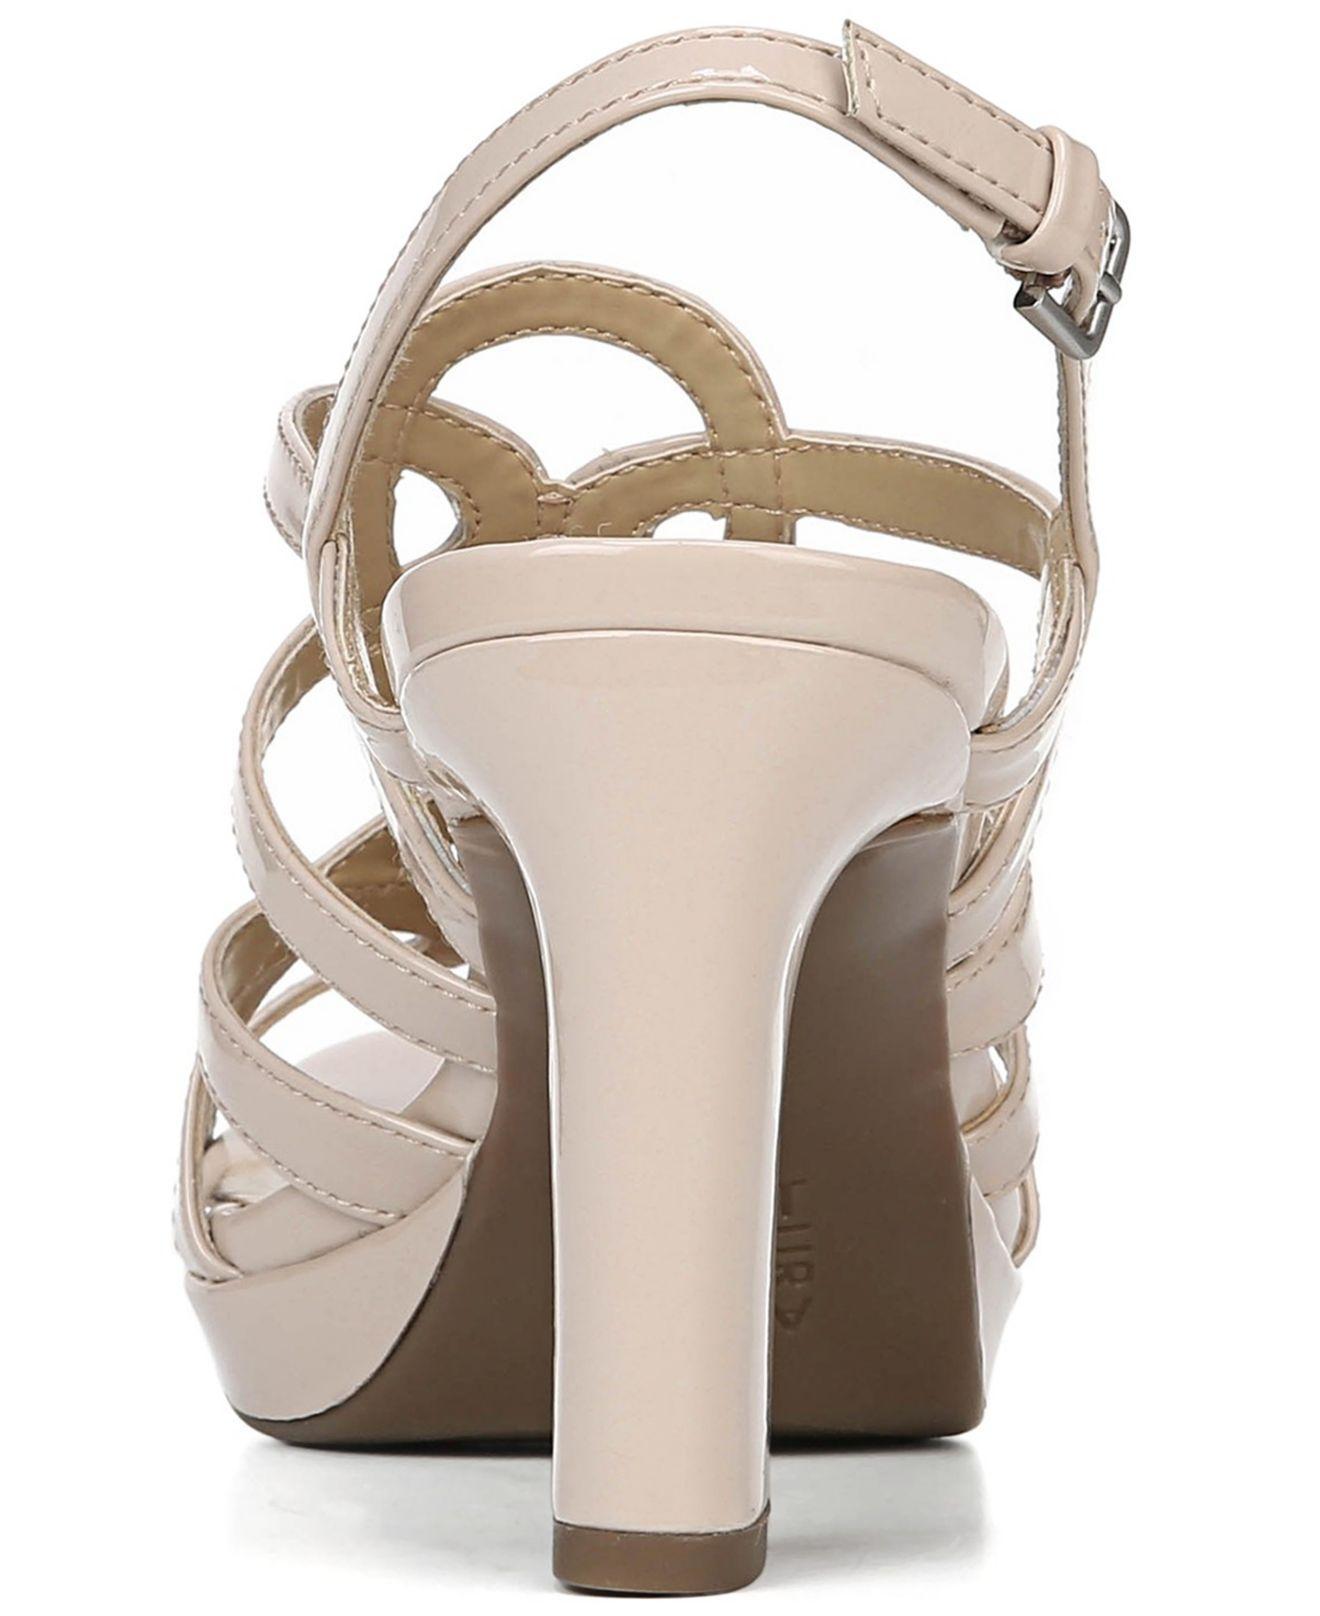 86b7fadaa8 Naturalizer - Purple Cameron Ankle Strap Sandals - Lyst. View fullscreen